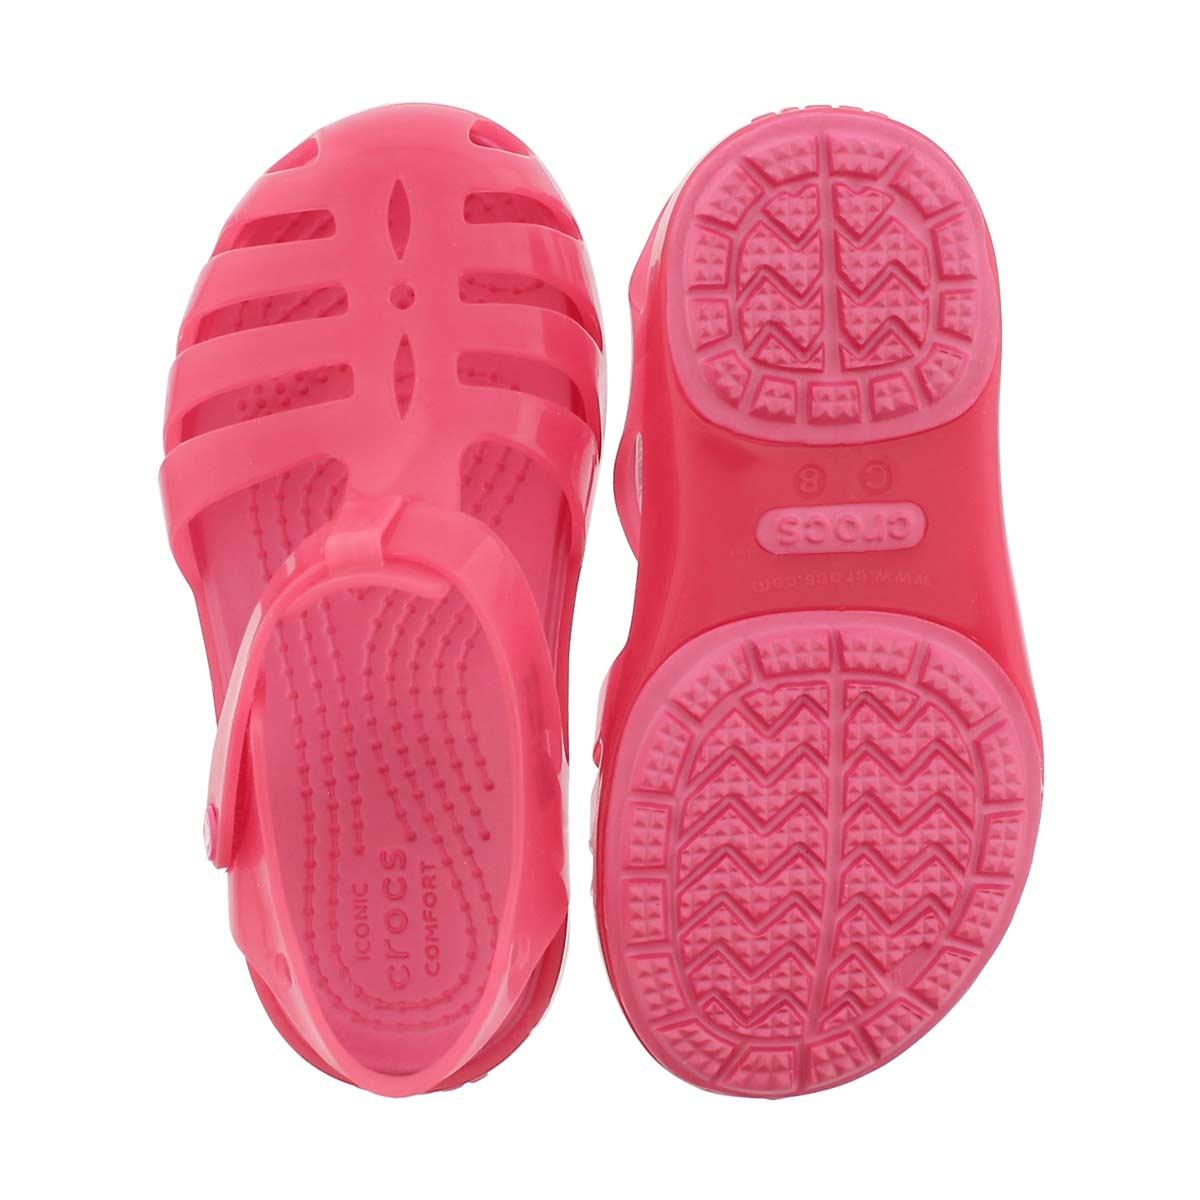 Grls Isabella paradise pnk casual sandal